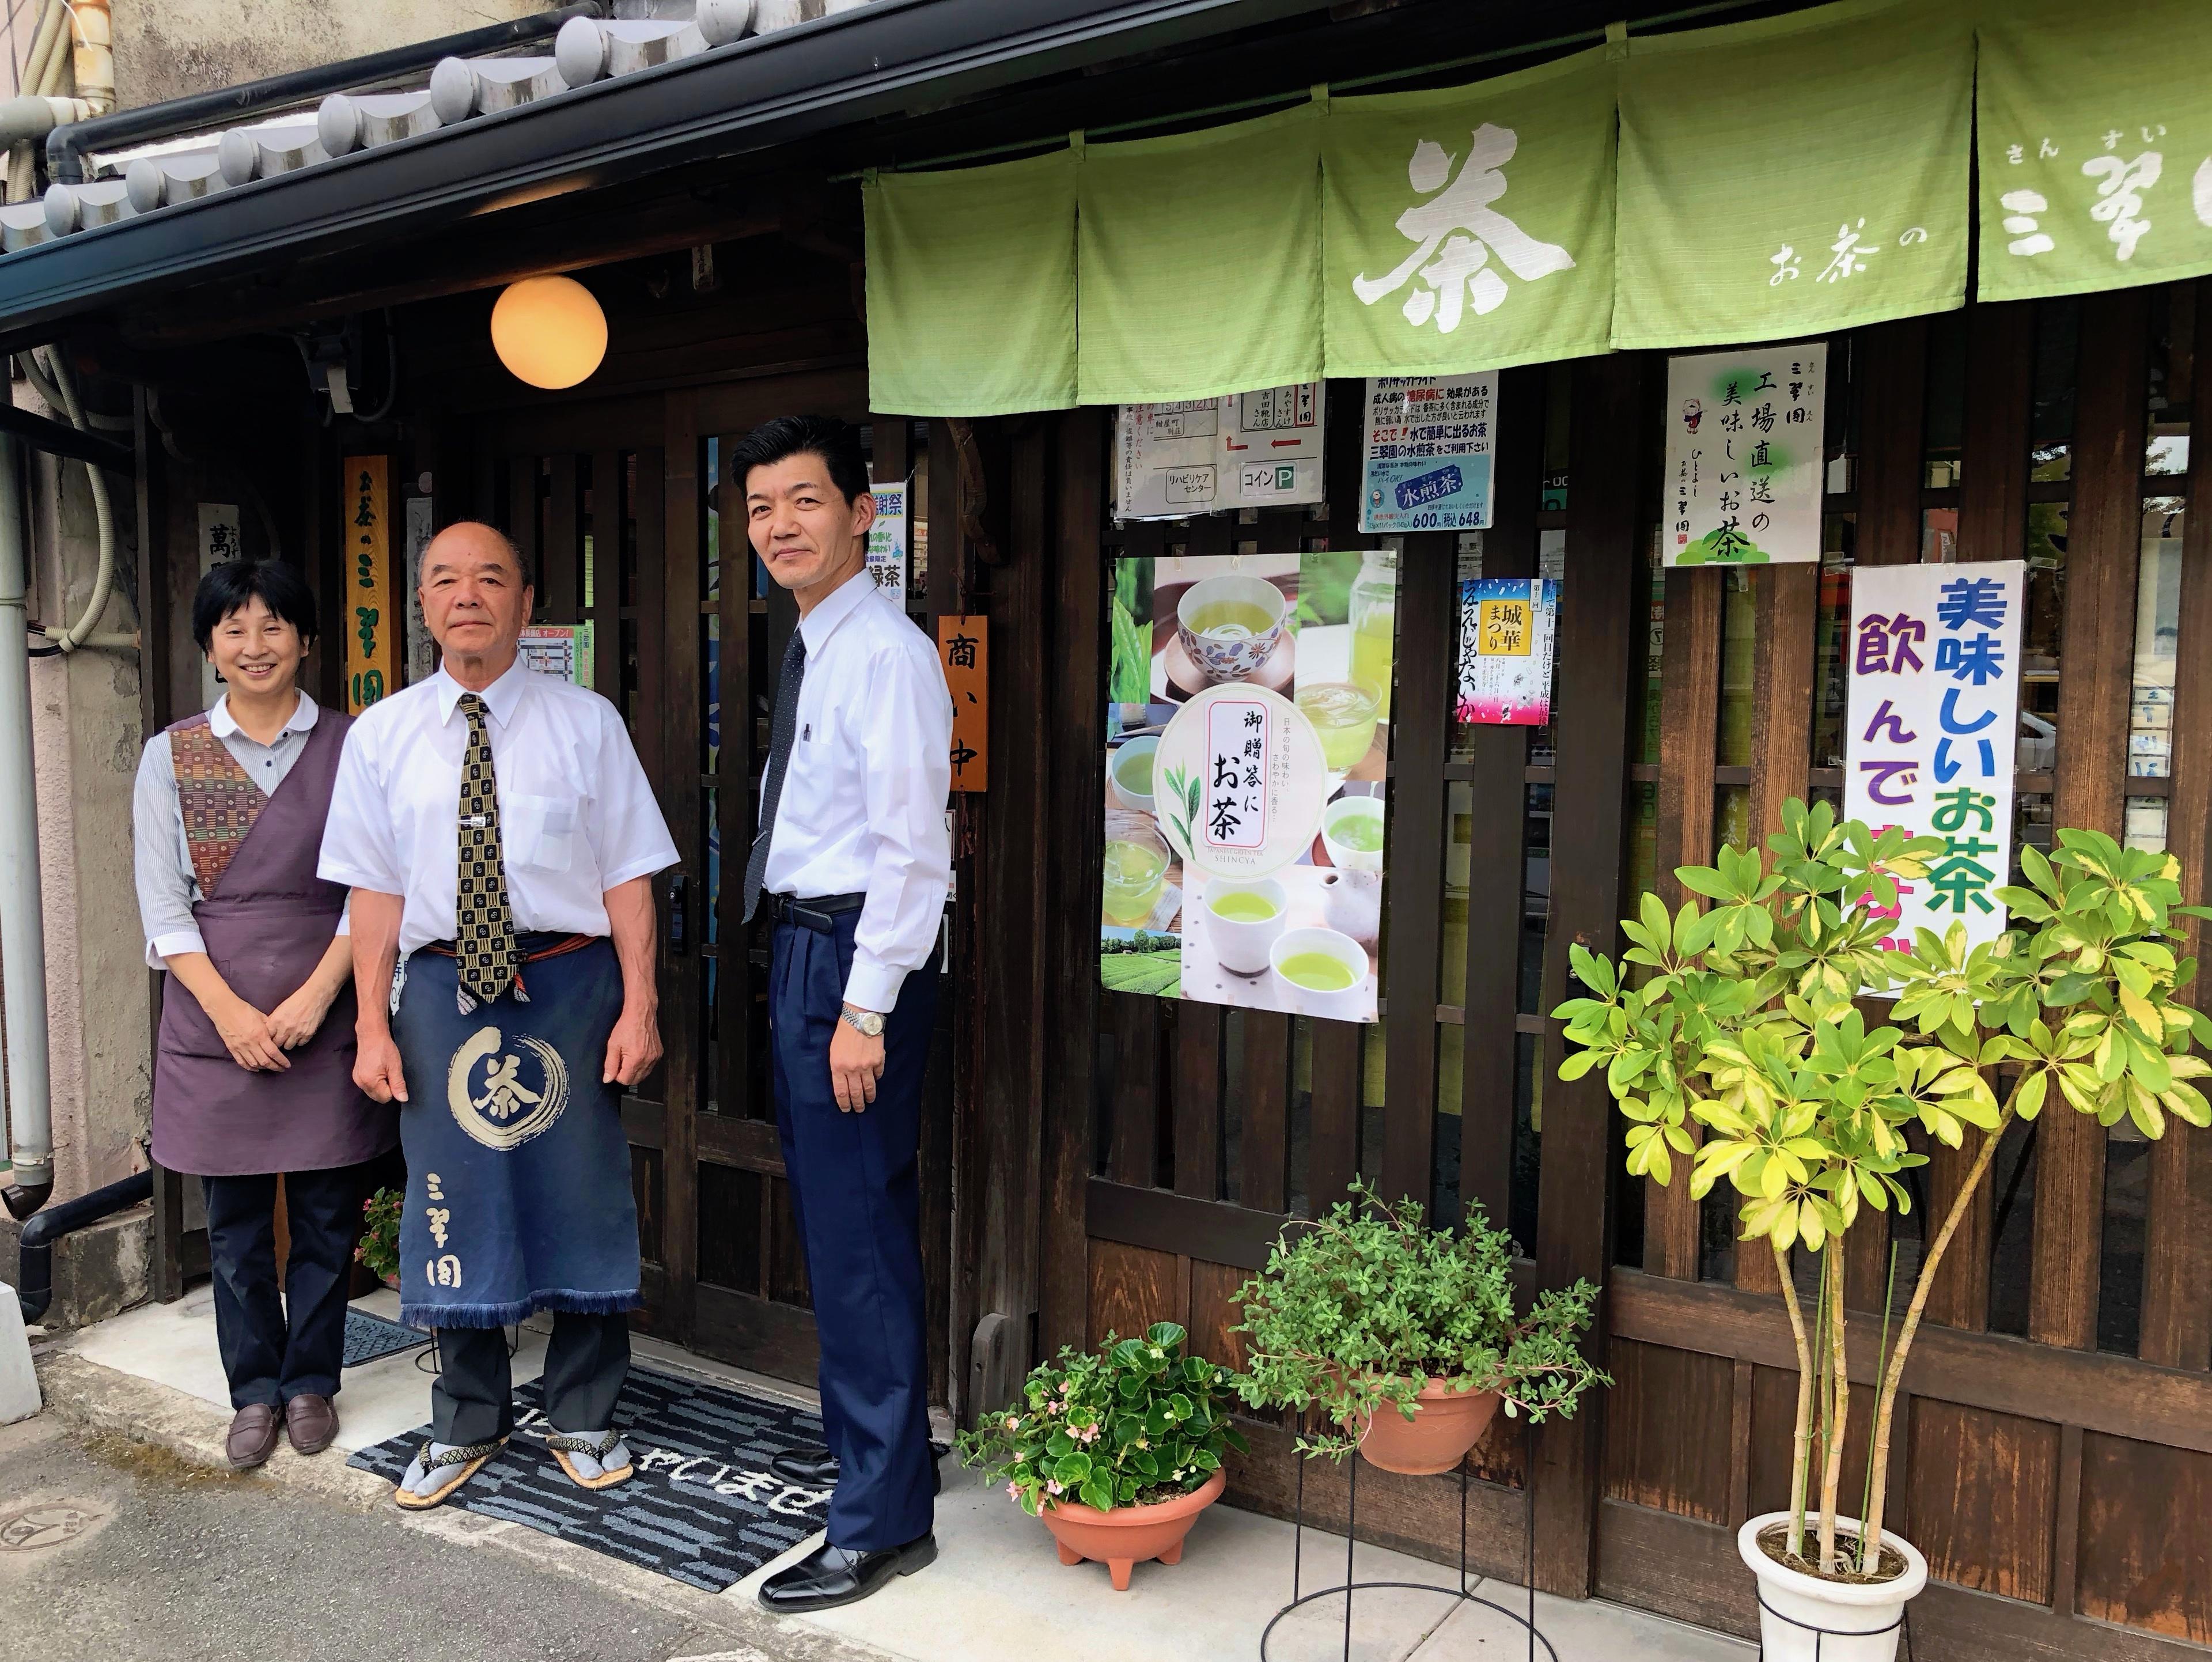 kumamoto city, Japan, 2018 120